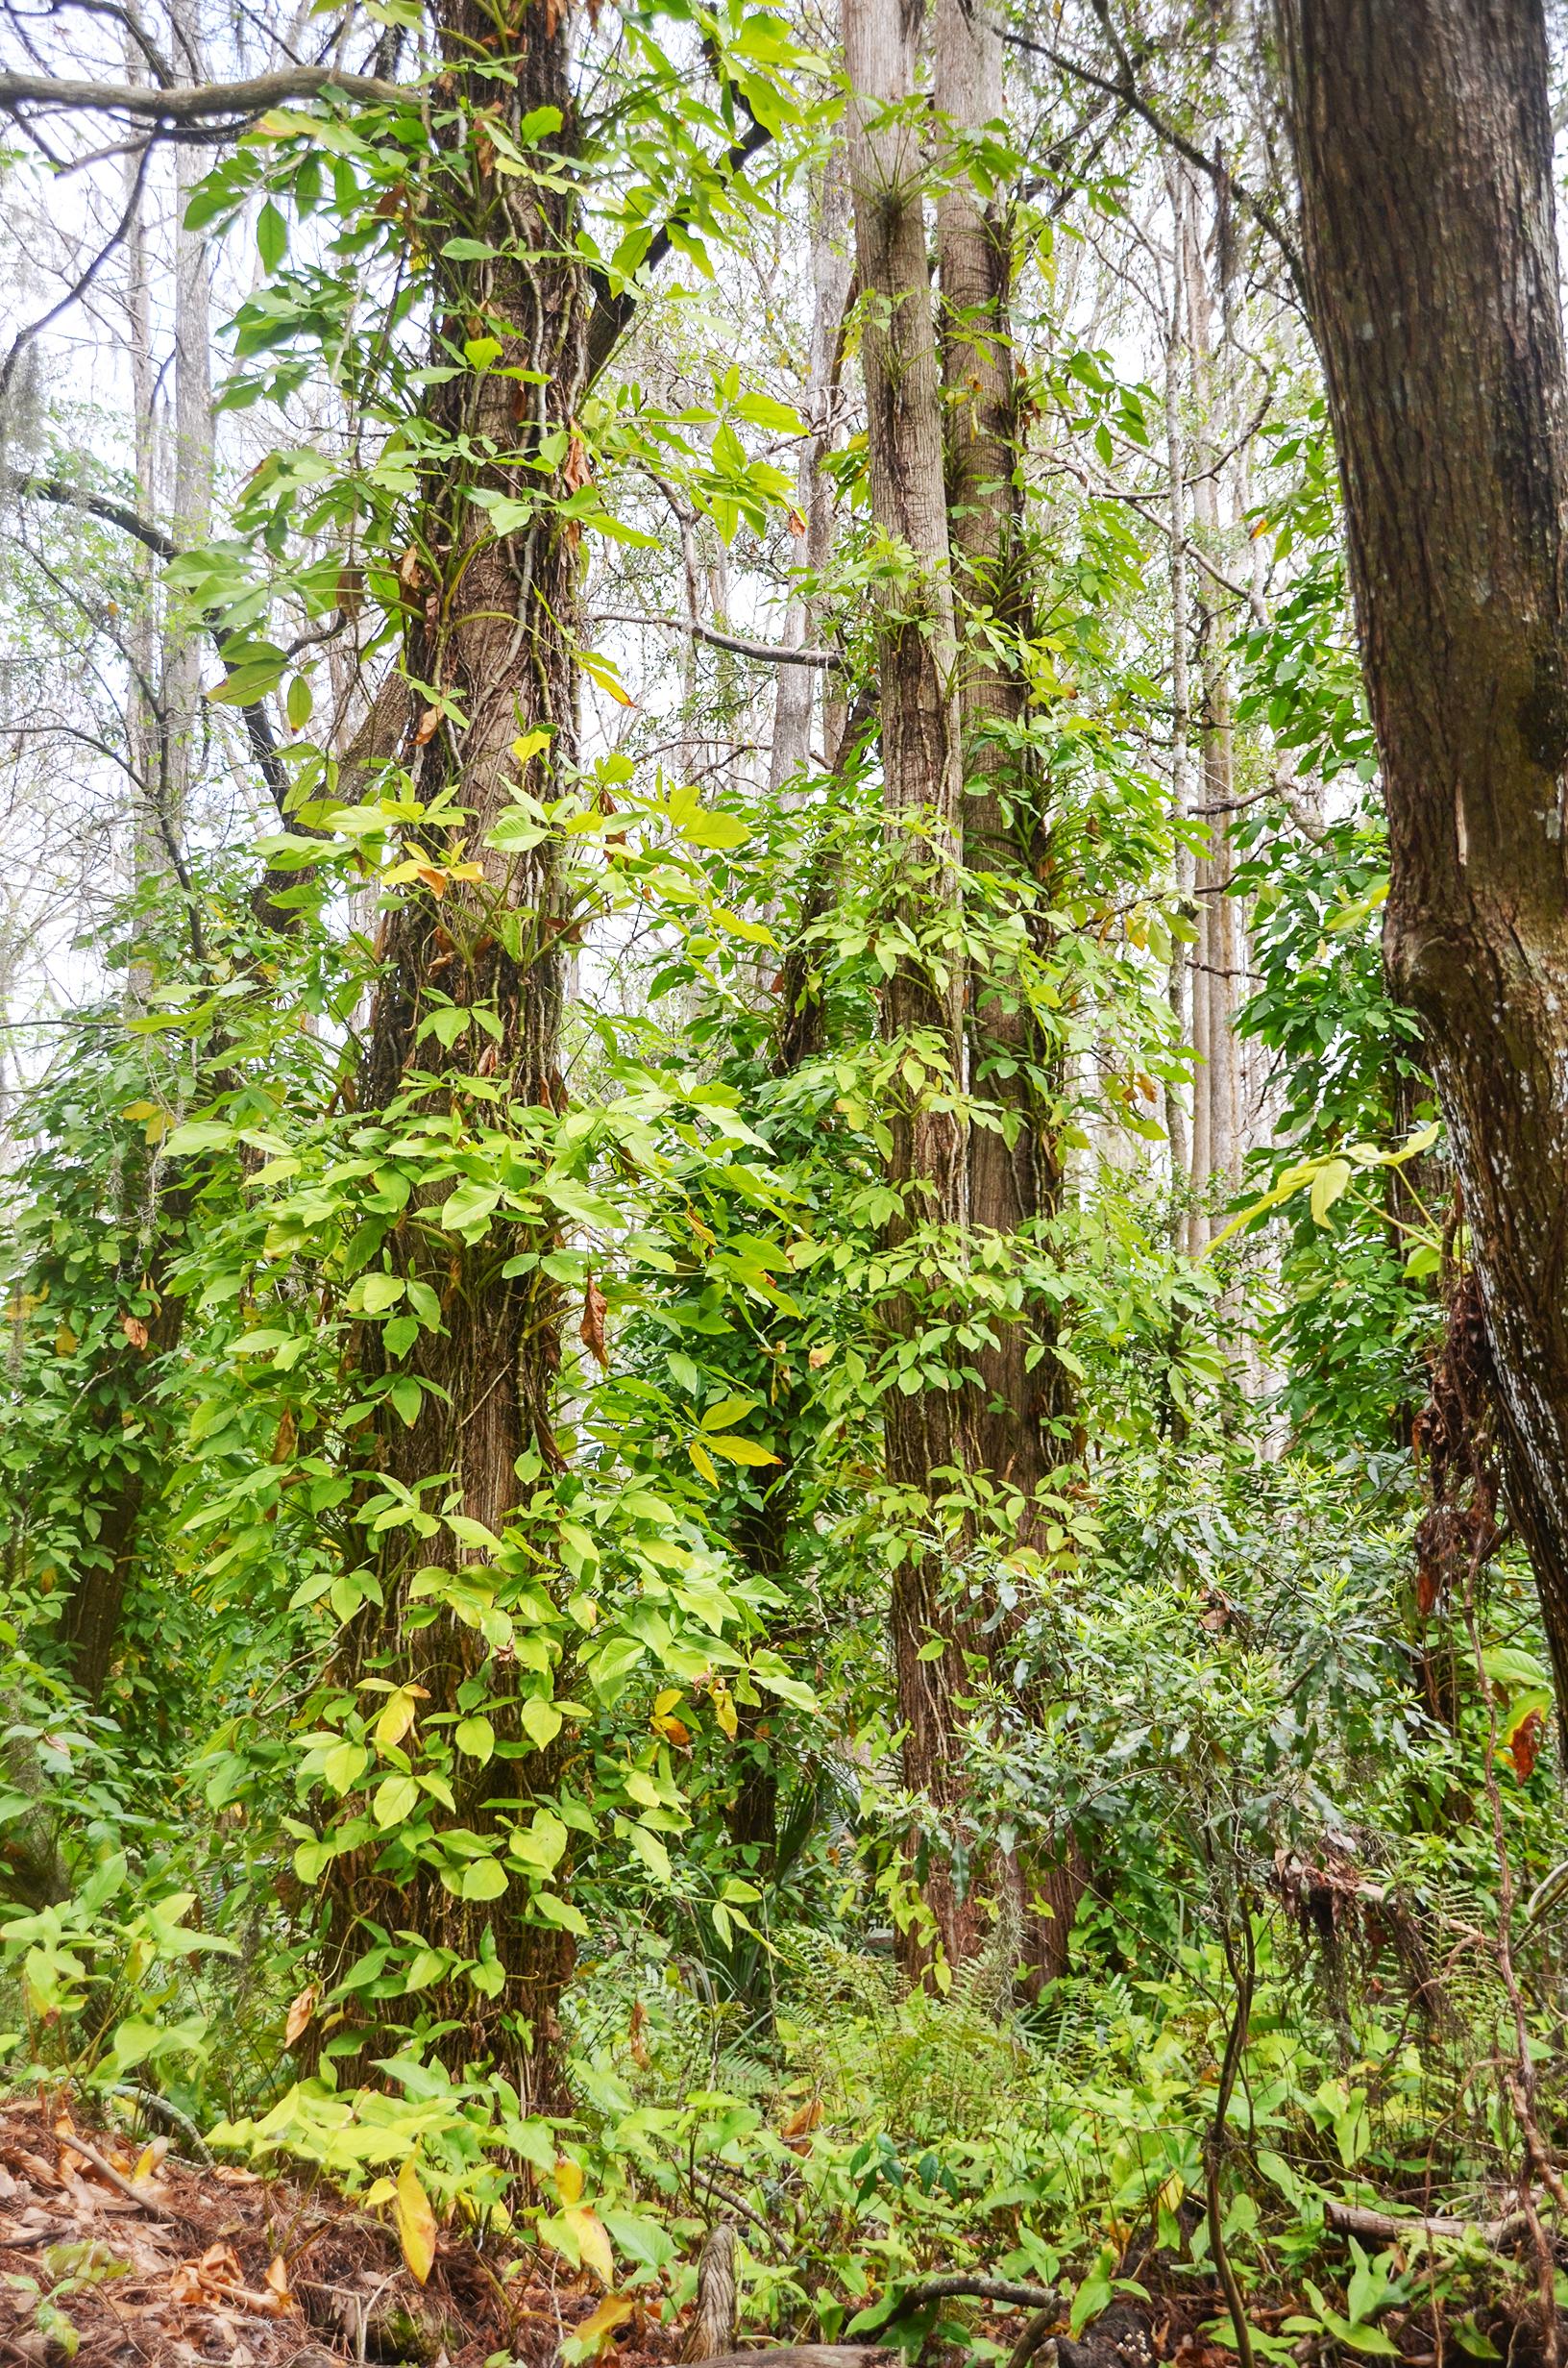 Arrowhead Vine - Syngonium podophyllum